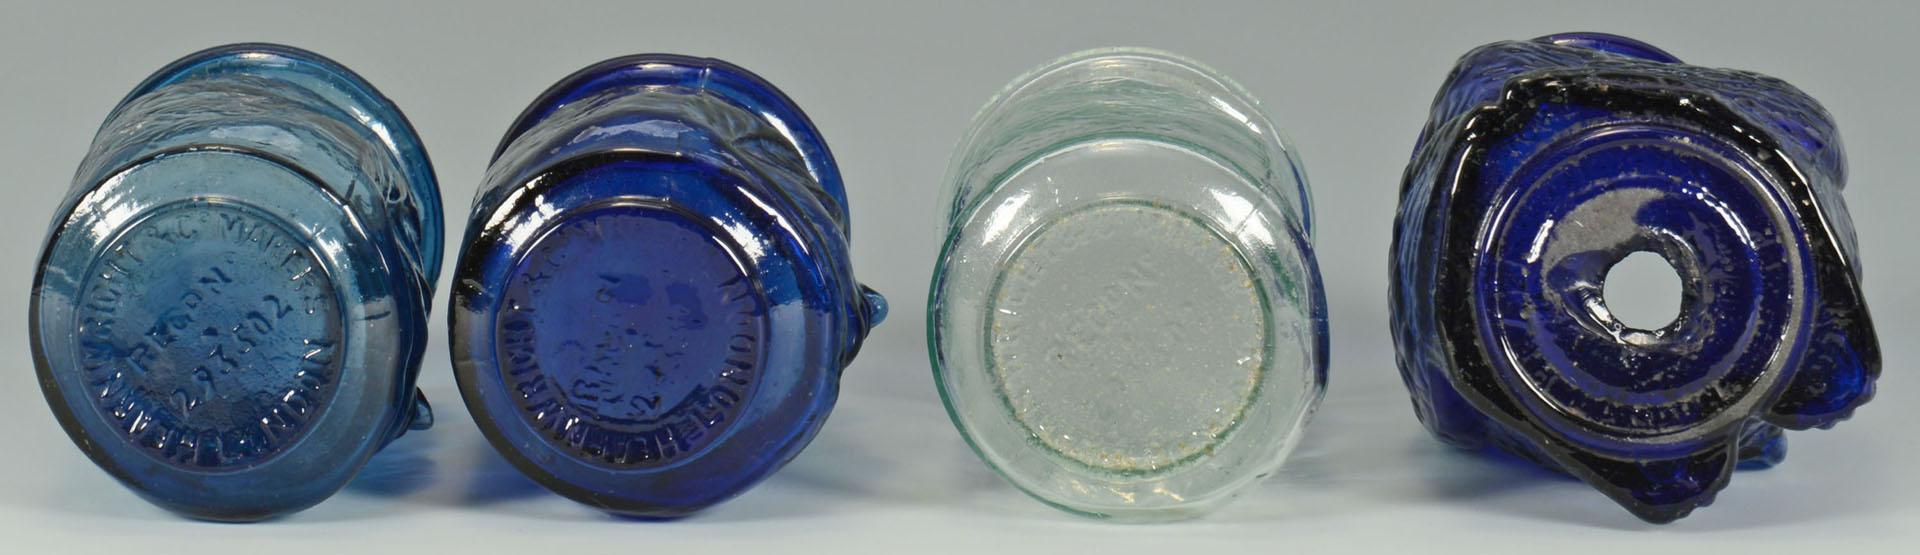 Lot 519: 10 Figural Glass Christmas Lights or Lanterns